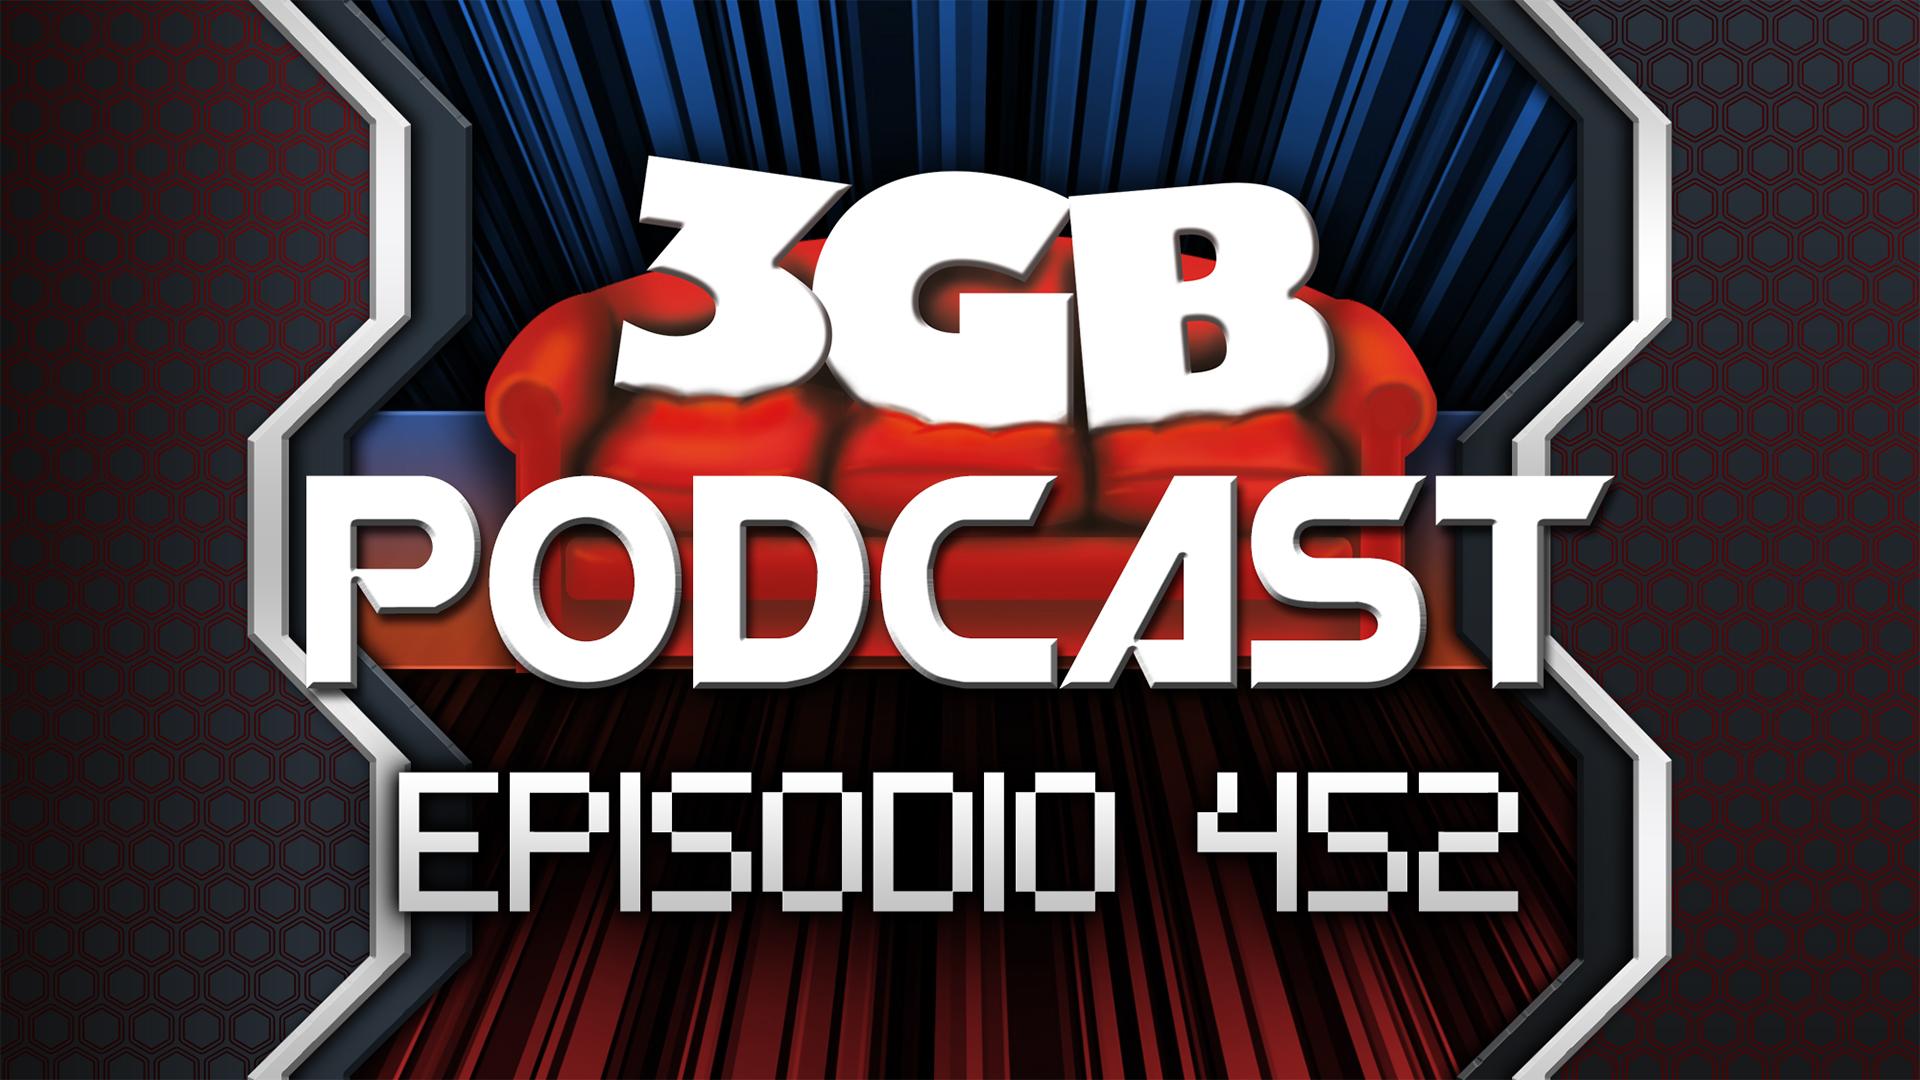 Podcast: Episodio 452, Operation Samus Returns y PlayStation Showcase 2021